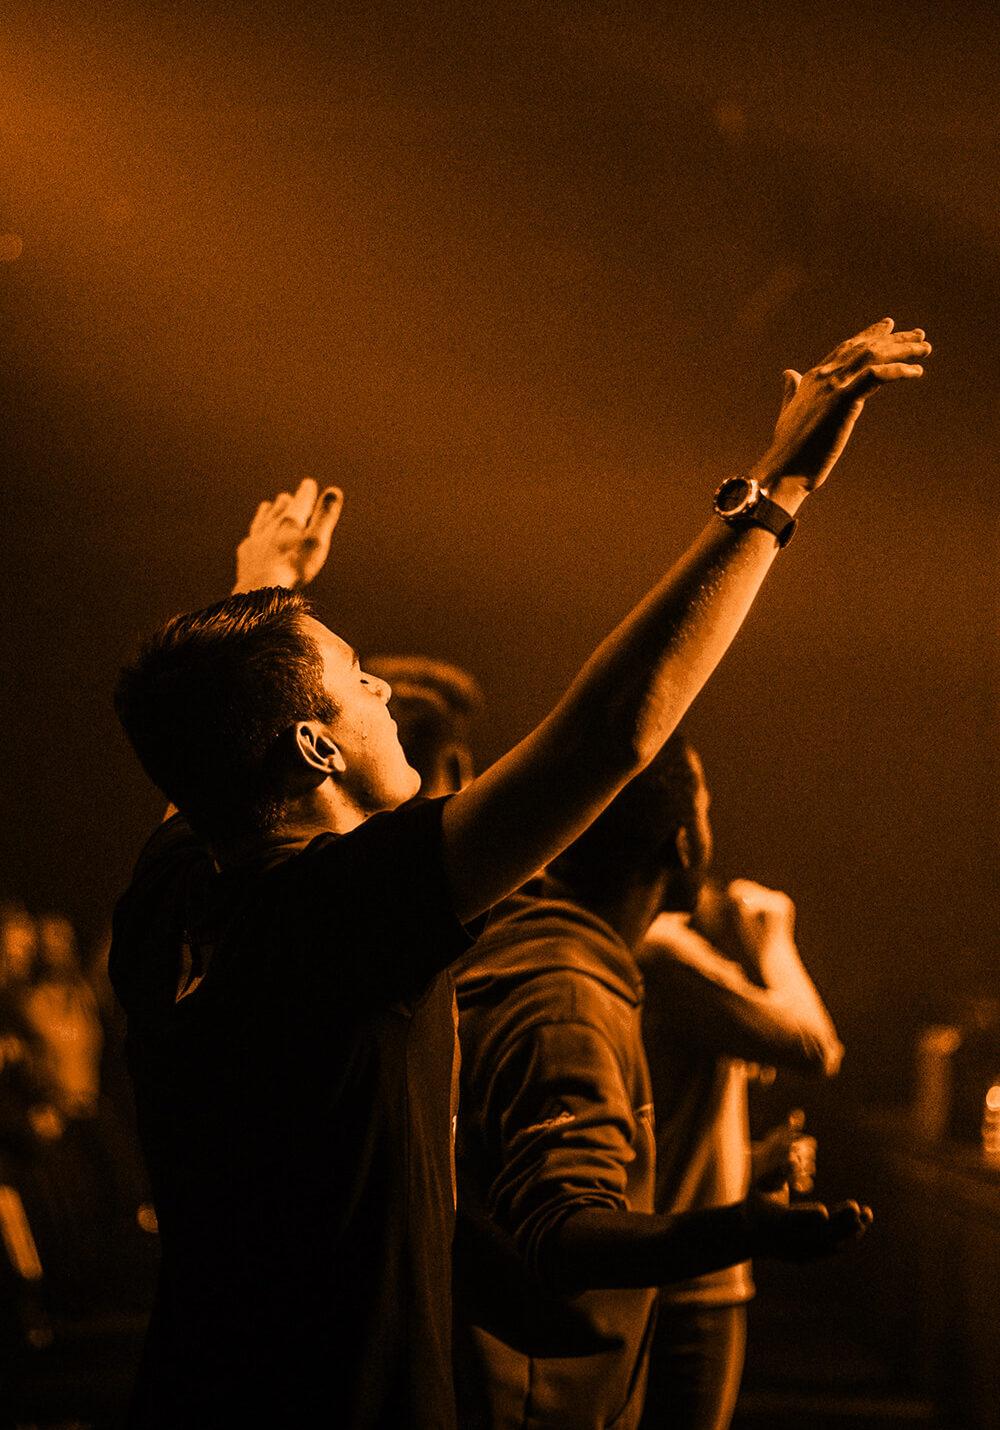 Man encountering Jesus in worship